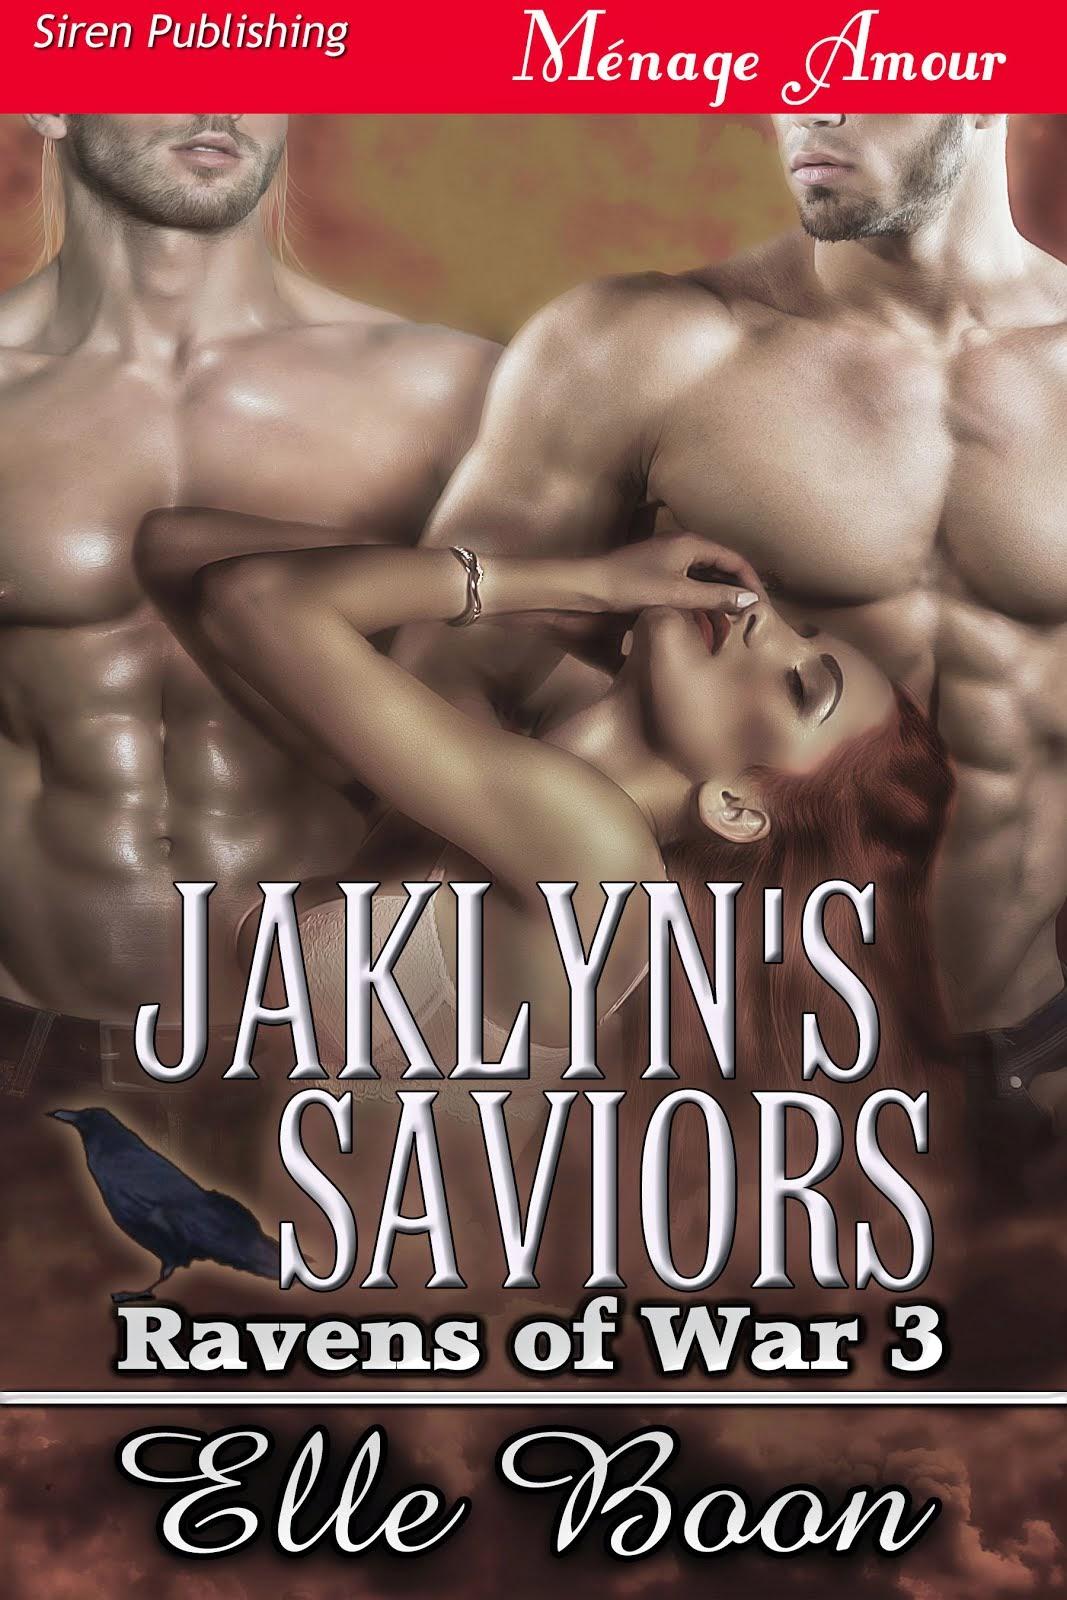 Jaklyn's Saviors